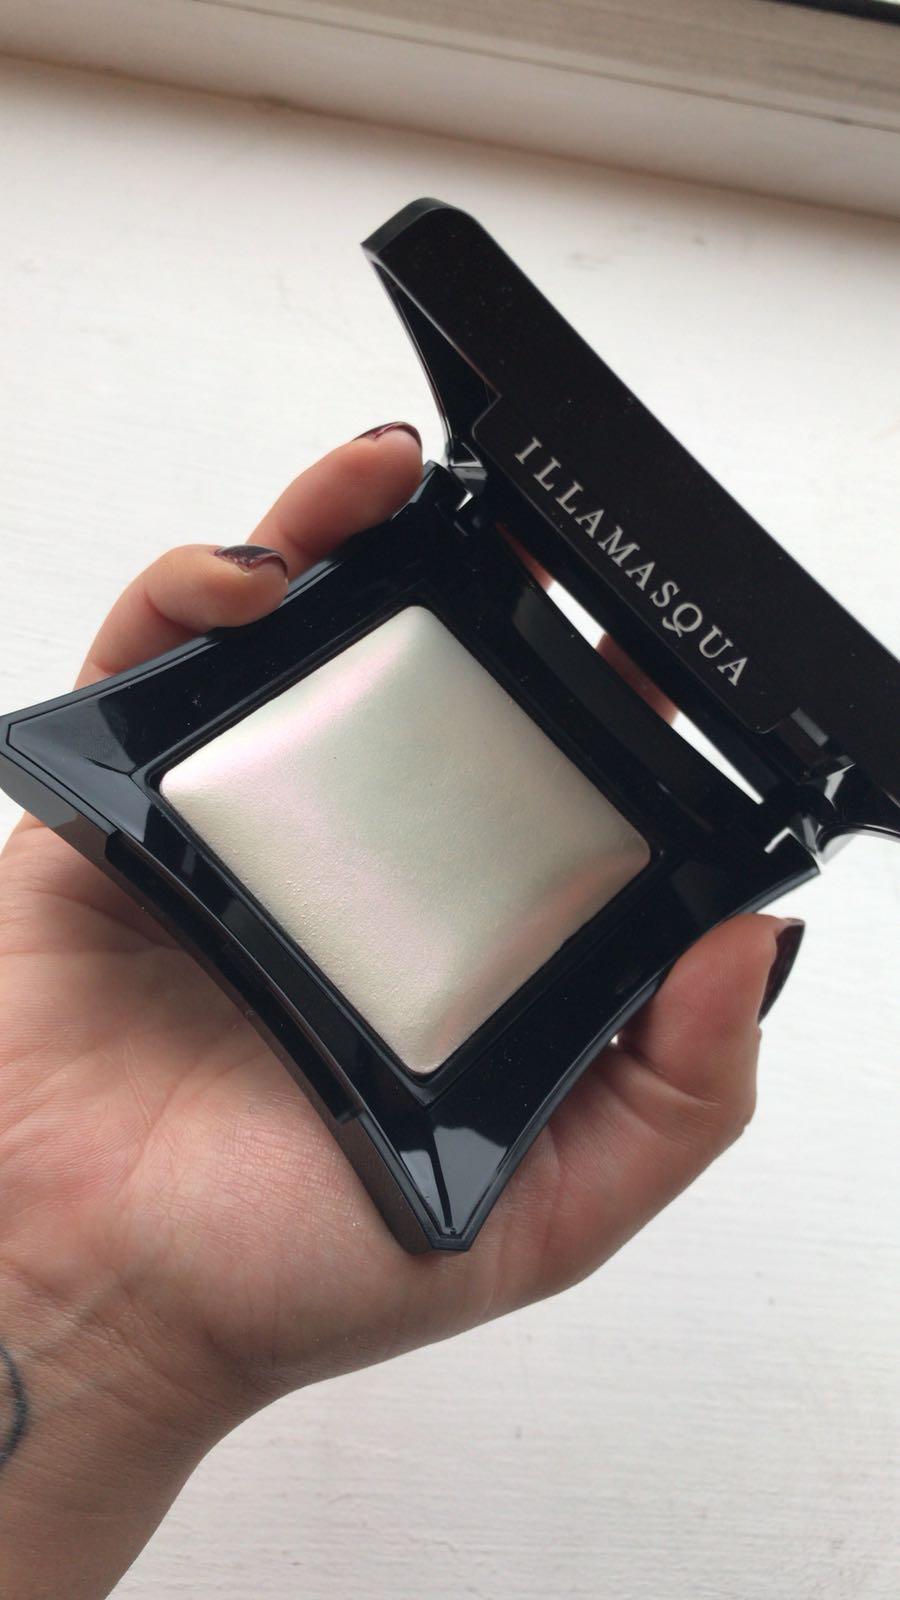 Illamasqua daze highlighter